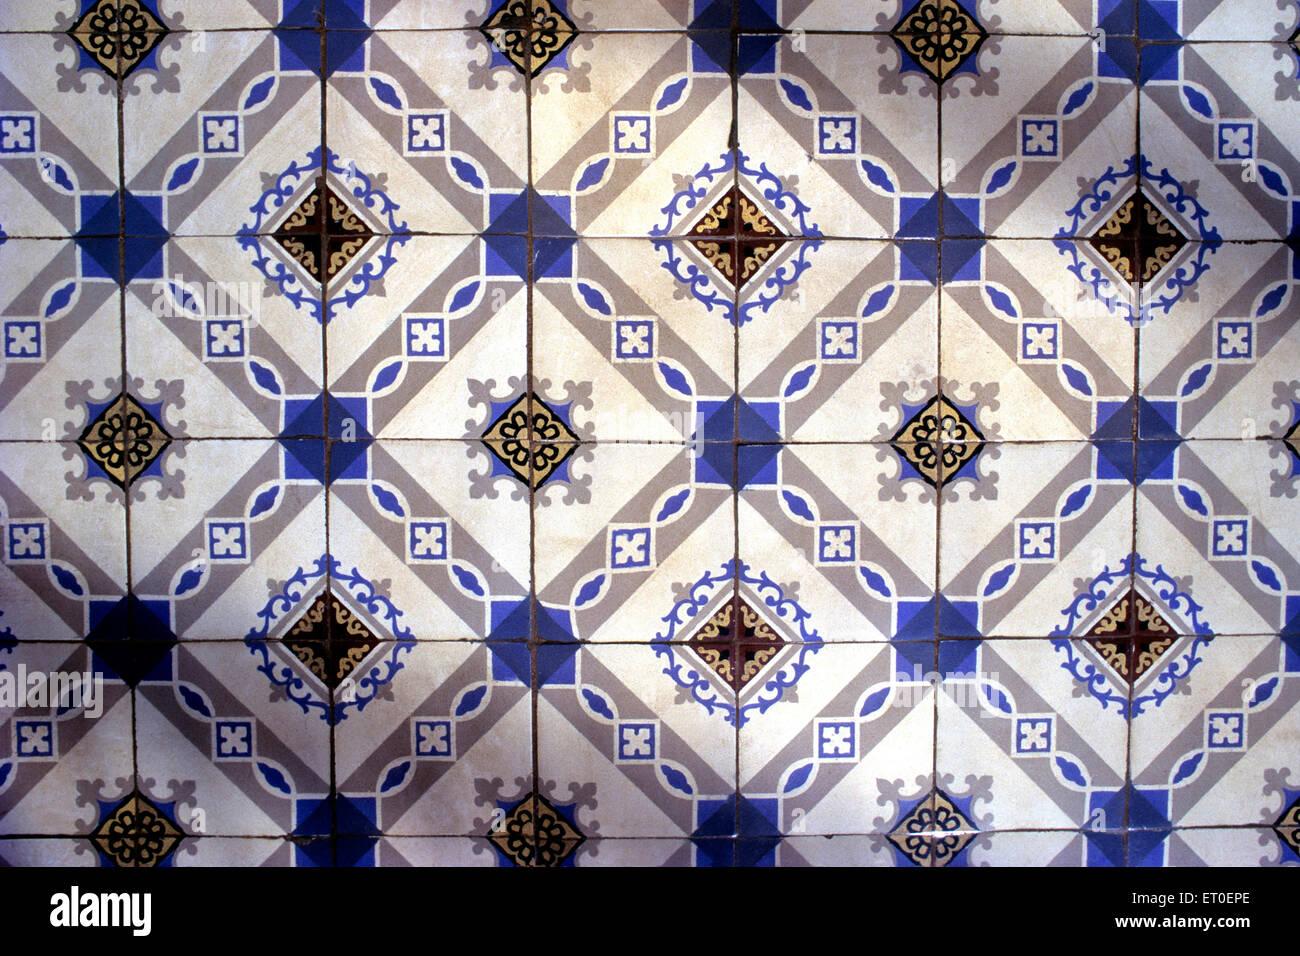 Floor tiles in Nattukottai Chettiar Nagarathar house of chettinad Tamil Nadu INDIA - Stock Image